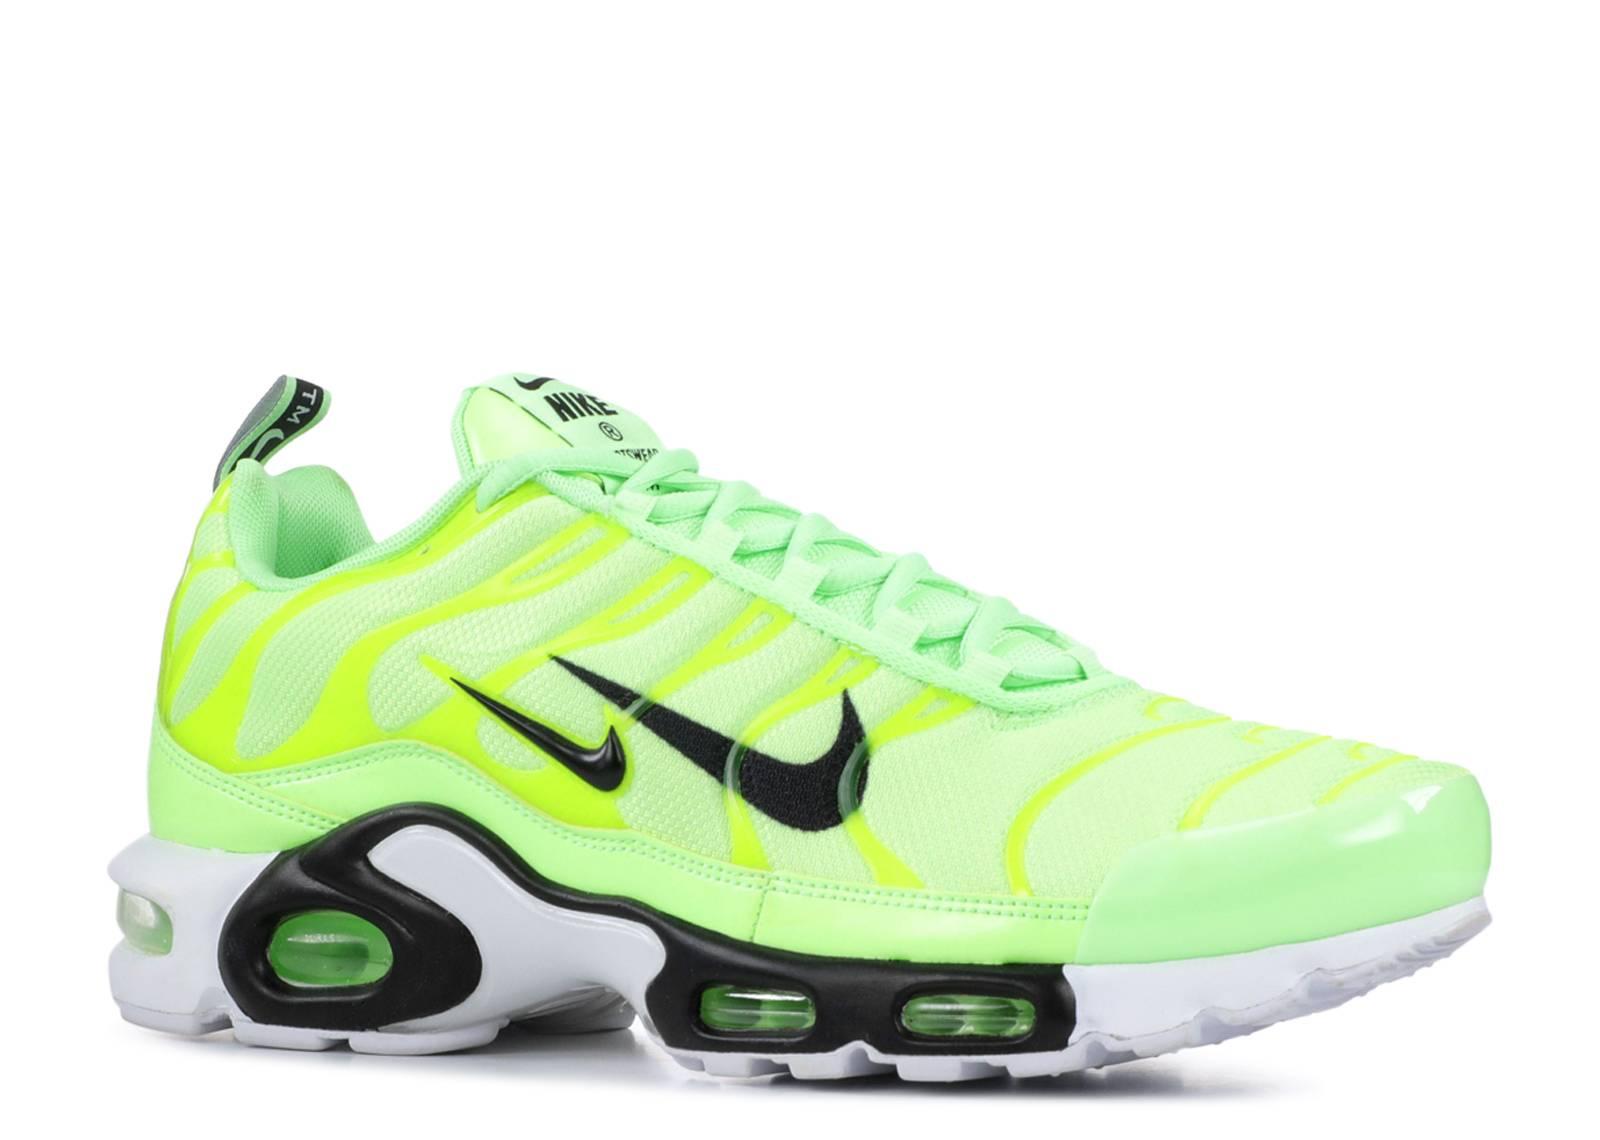 537e29cb29 ... Nike Air Max Plus Premium 'Overbranding - Lime Blast'